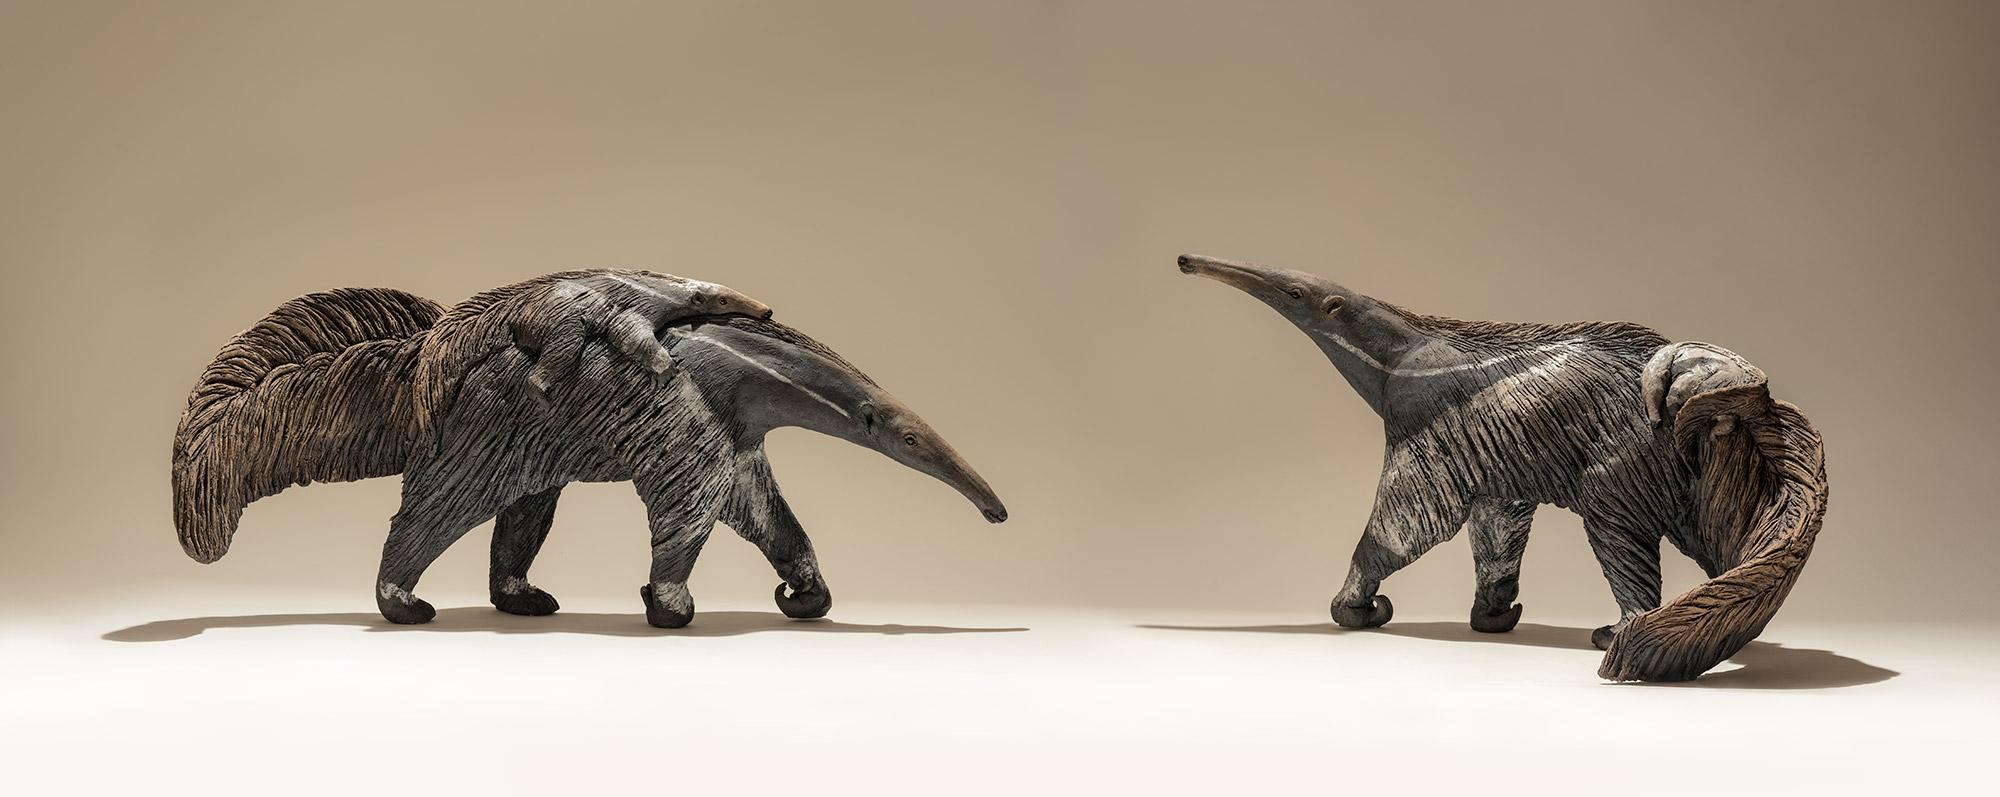 Anteater Sculptures